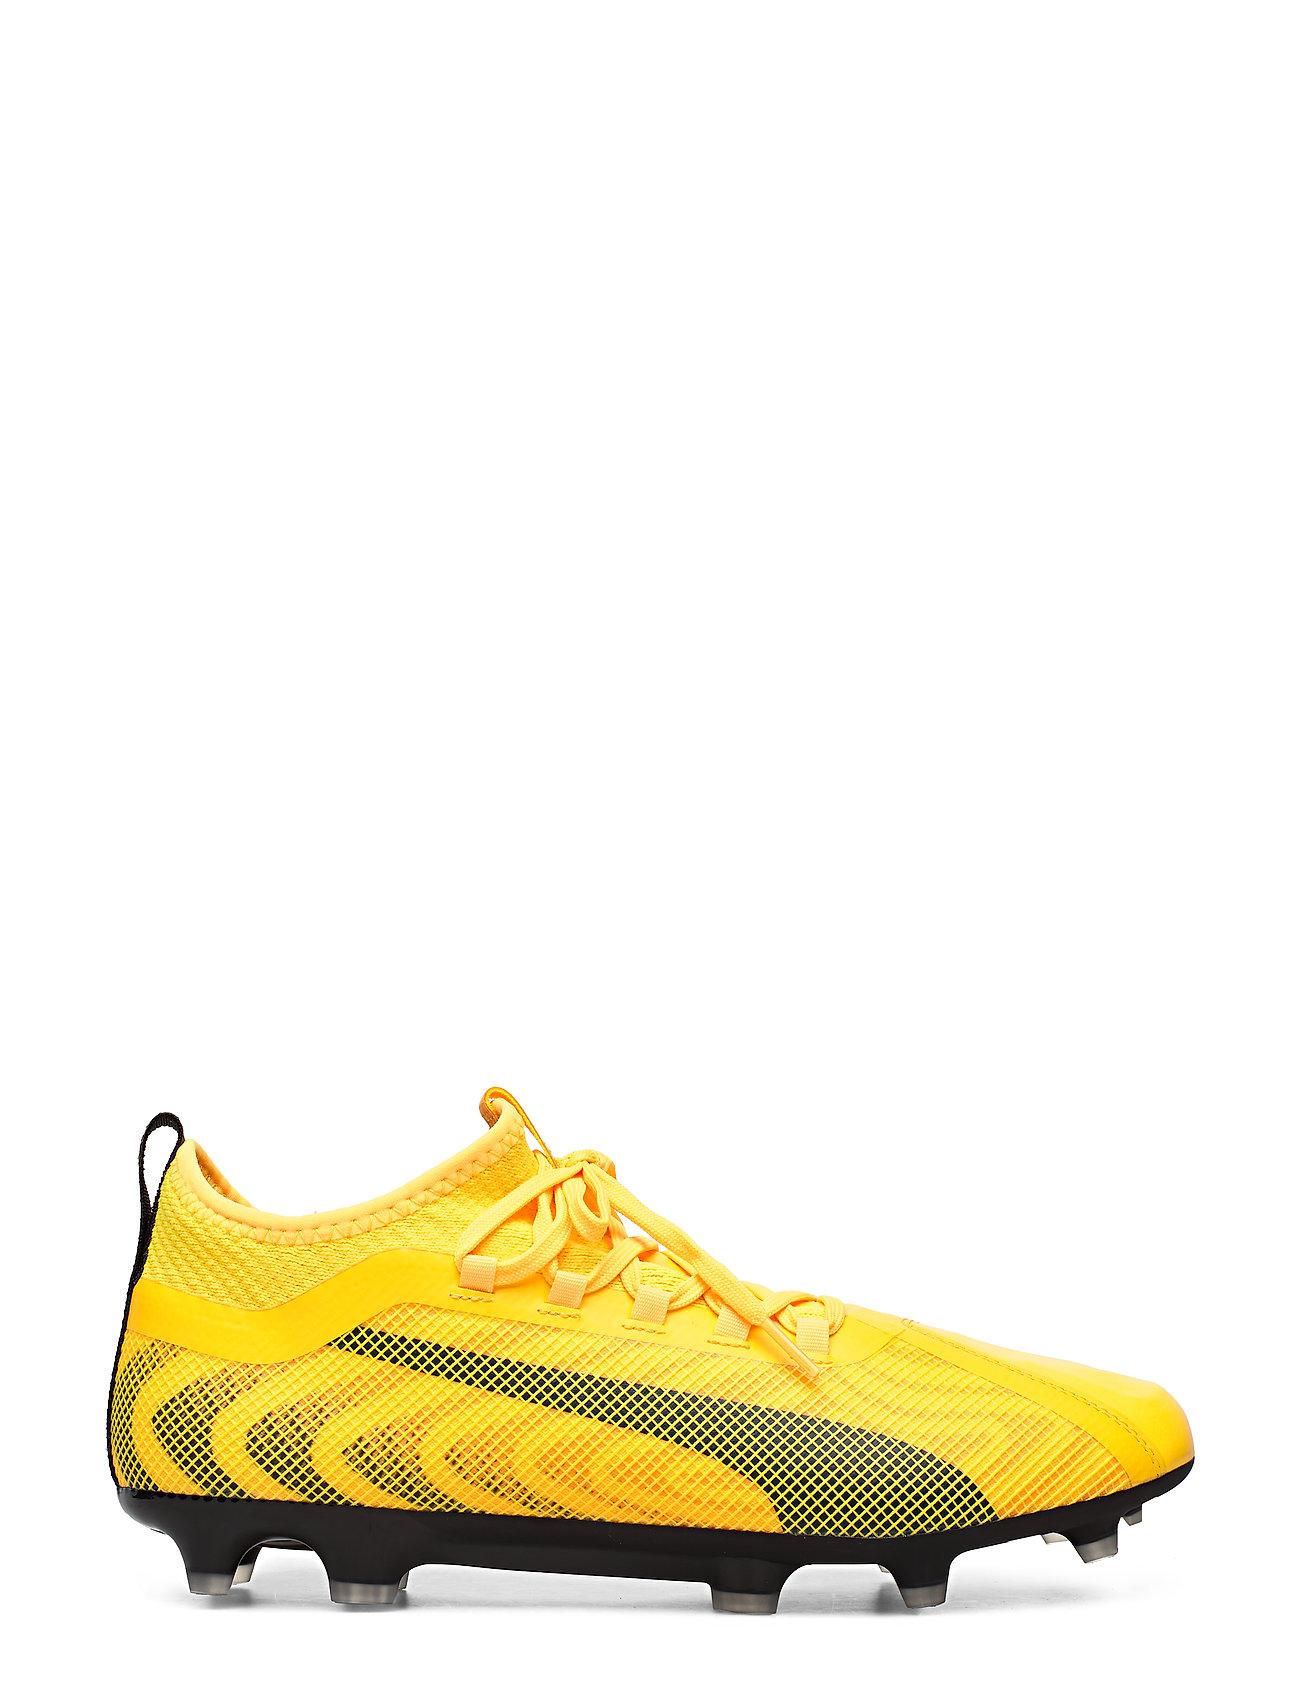 Puma 20.2 Fg/Ag Shoes Sport Shoes Football Boots Gul PUMA